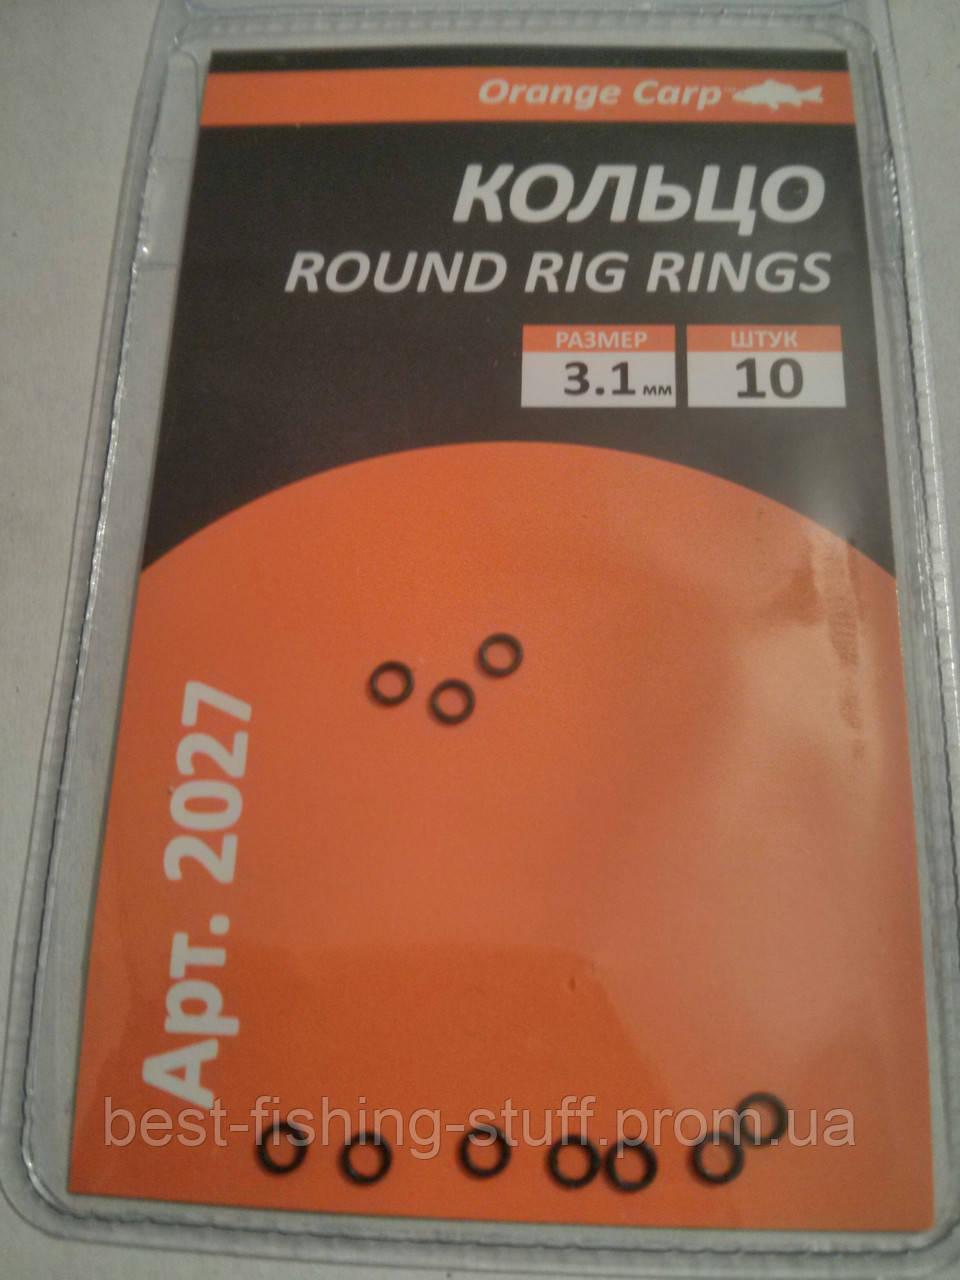 Кольцо ROUND RIG RINGS - F-16.COM.UA в Харькове